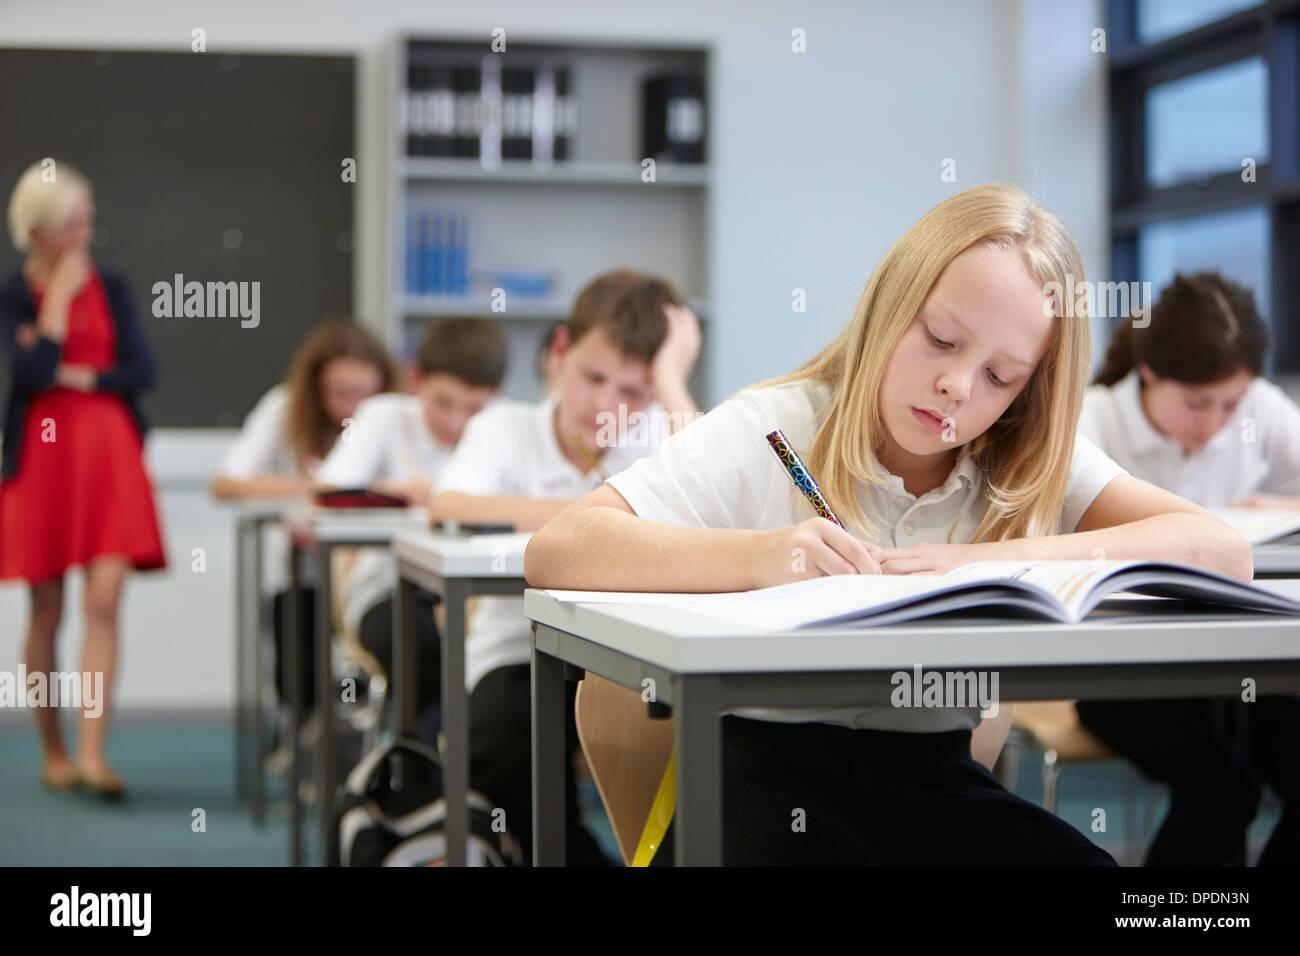 Female teacher watching class doing educational exam - Stock Image